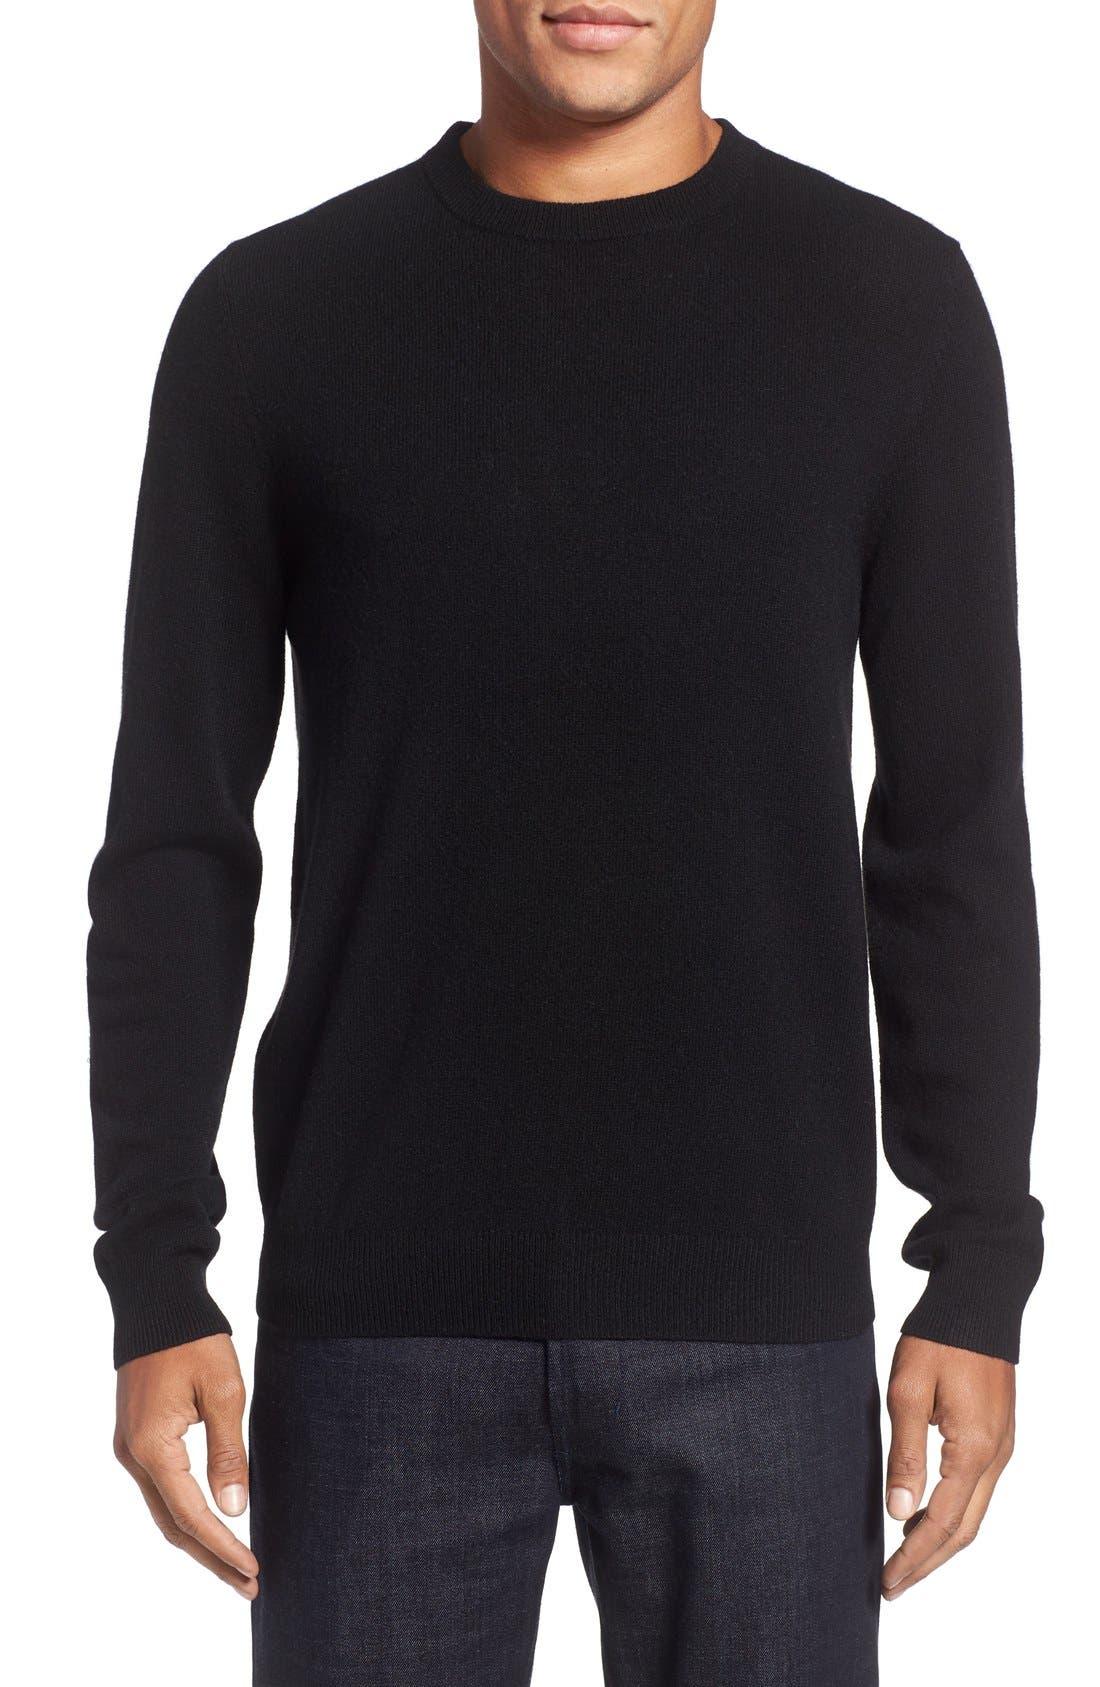 Nordstrom Shop Cashmere Crewneck Sweater, Black